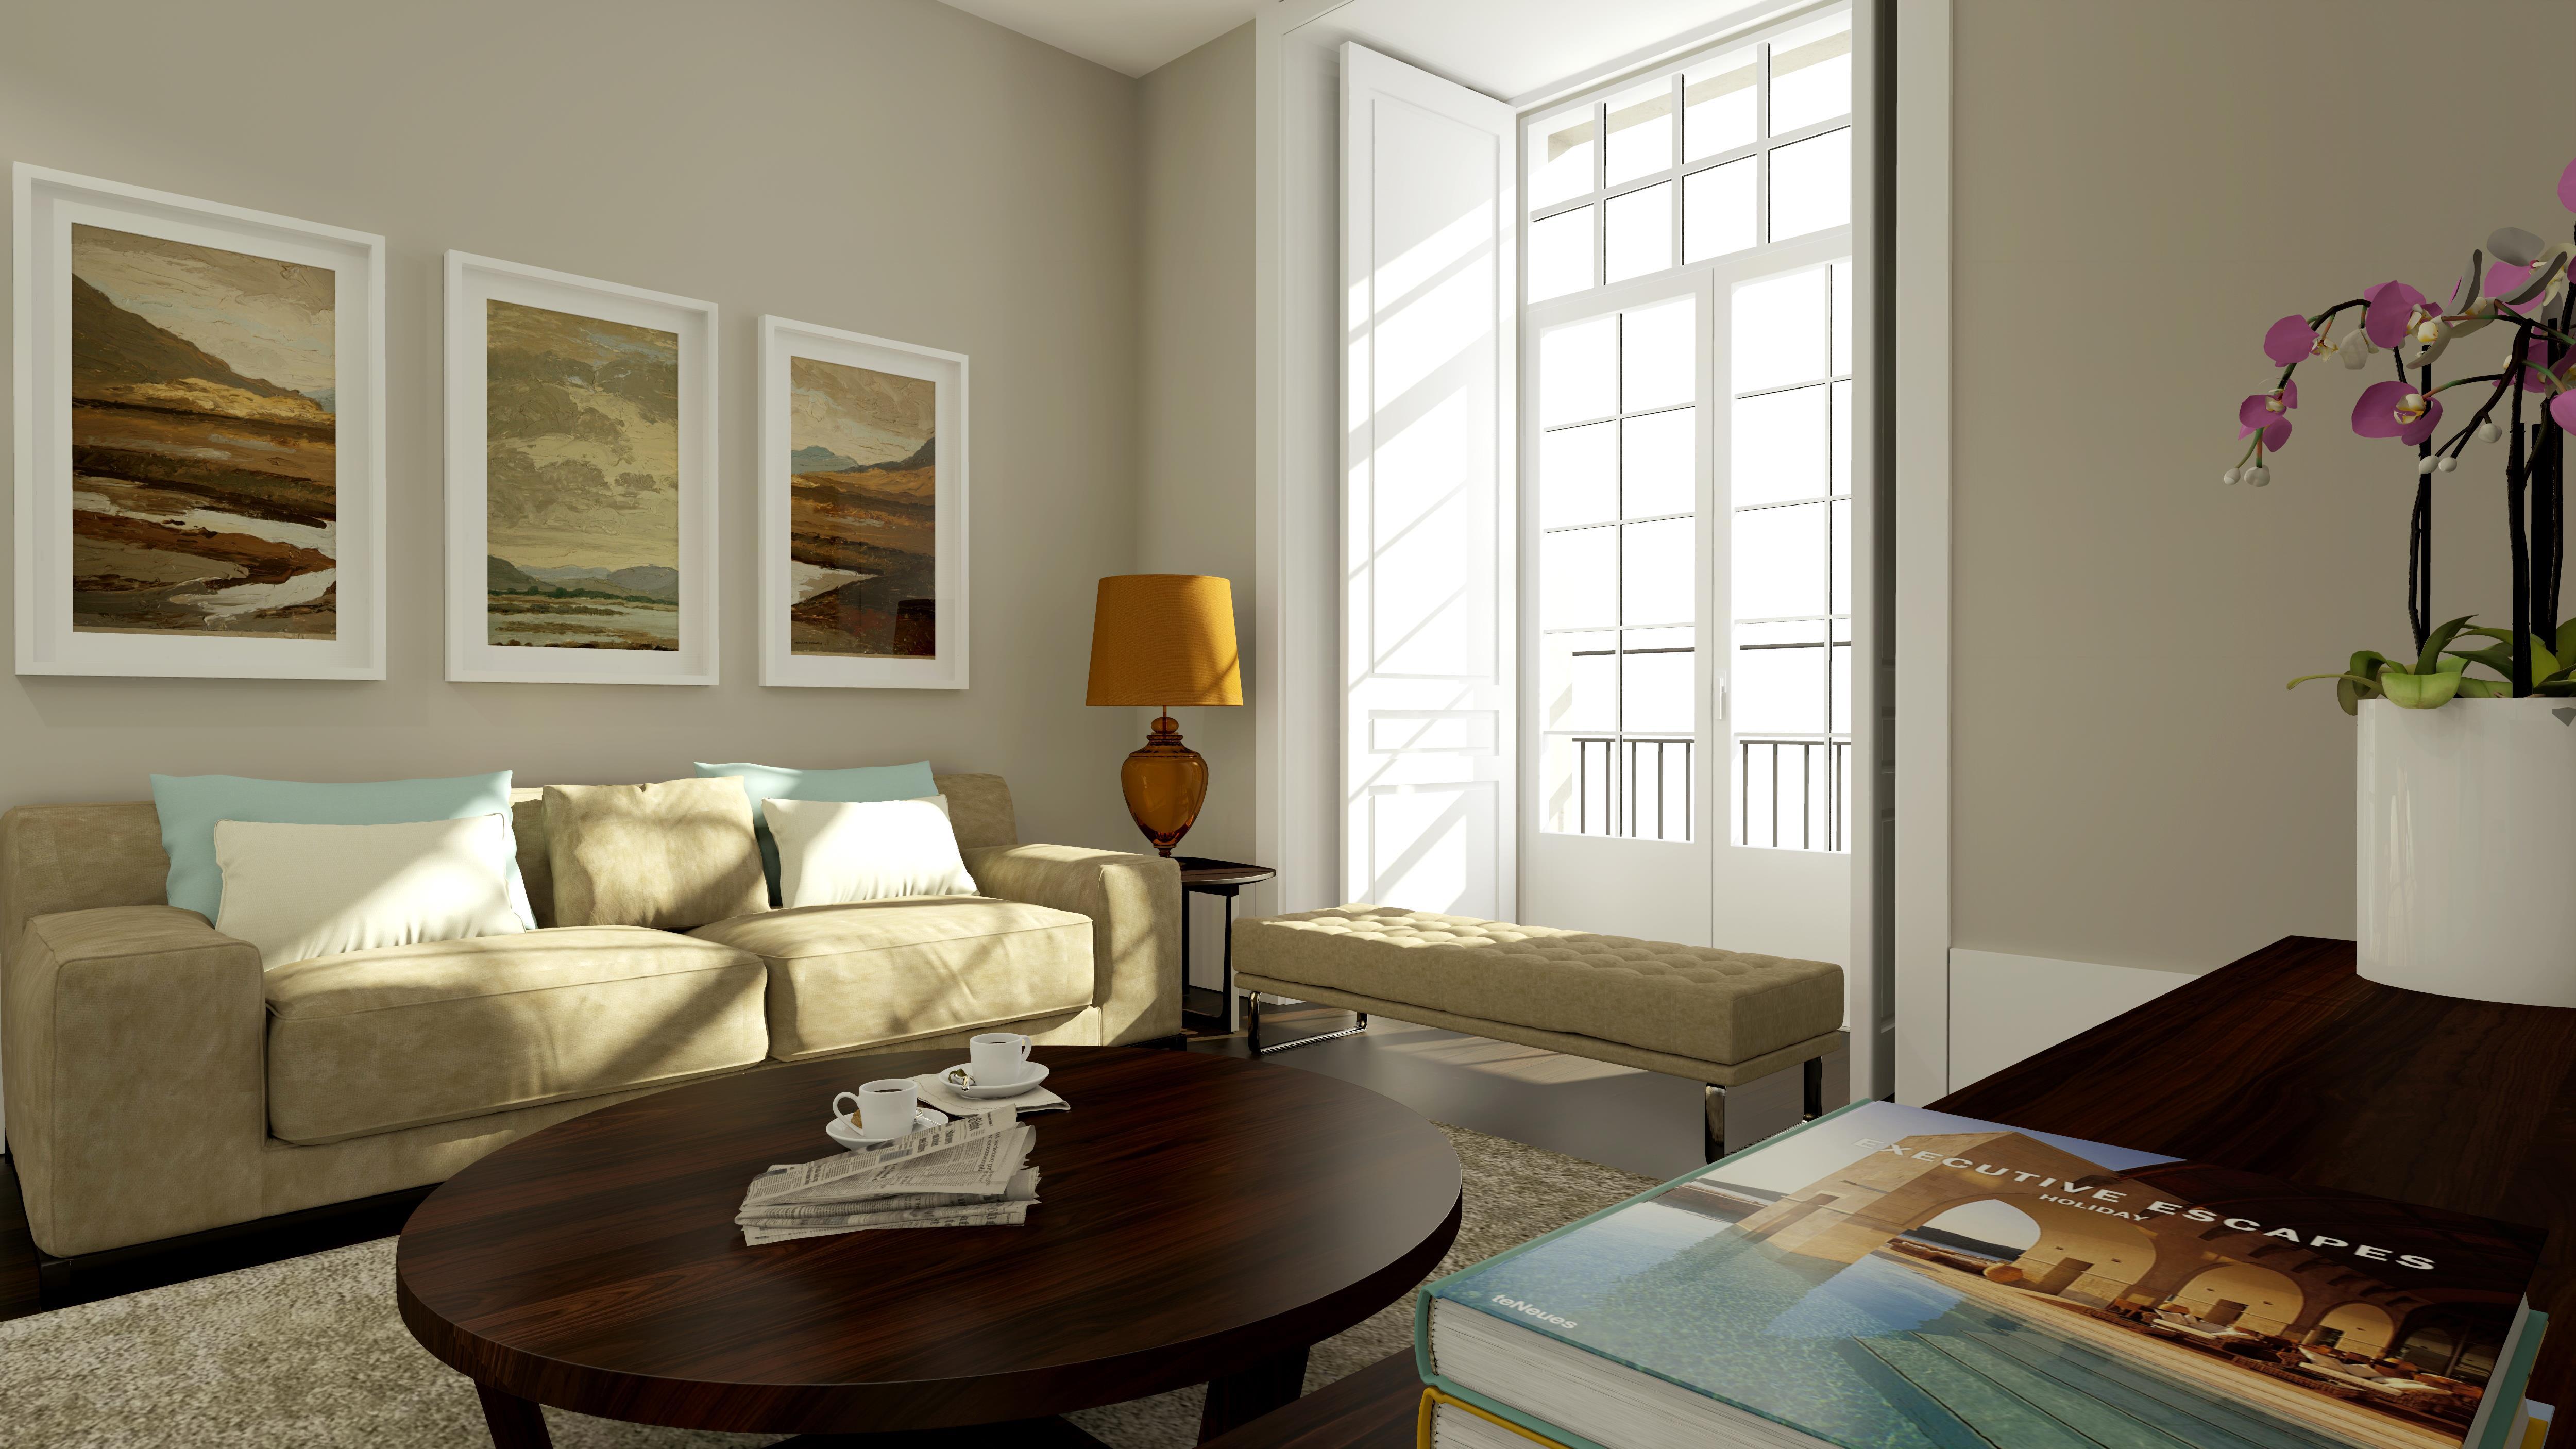 Apartment for Sale at Flat, 1 bedrooms, for Sale Lisboa, Lisboa, Portugal